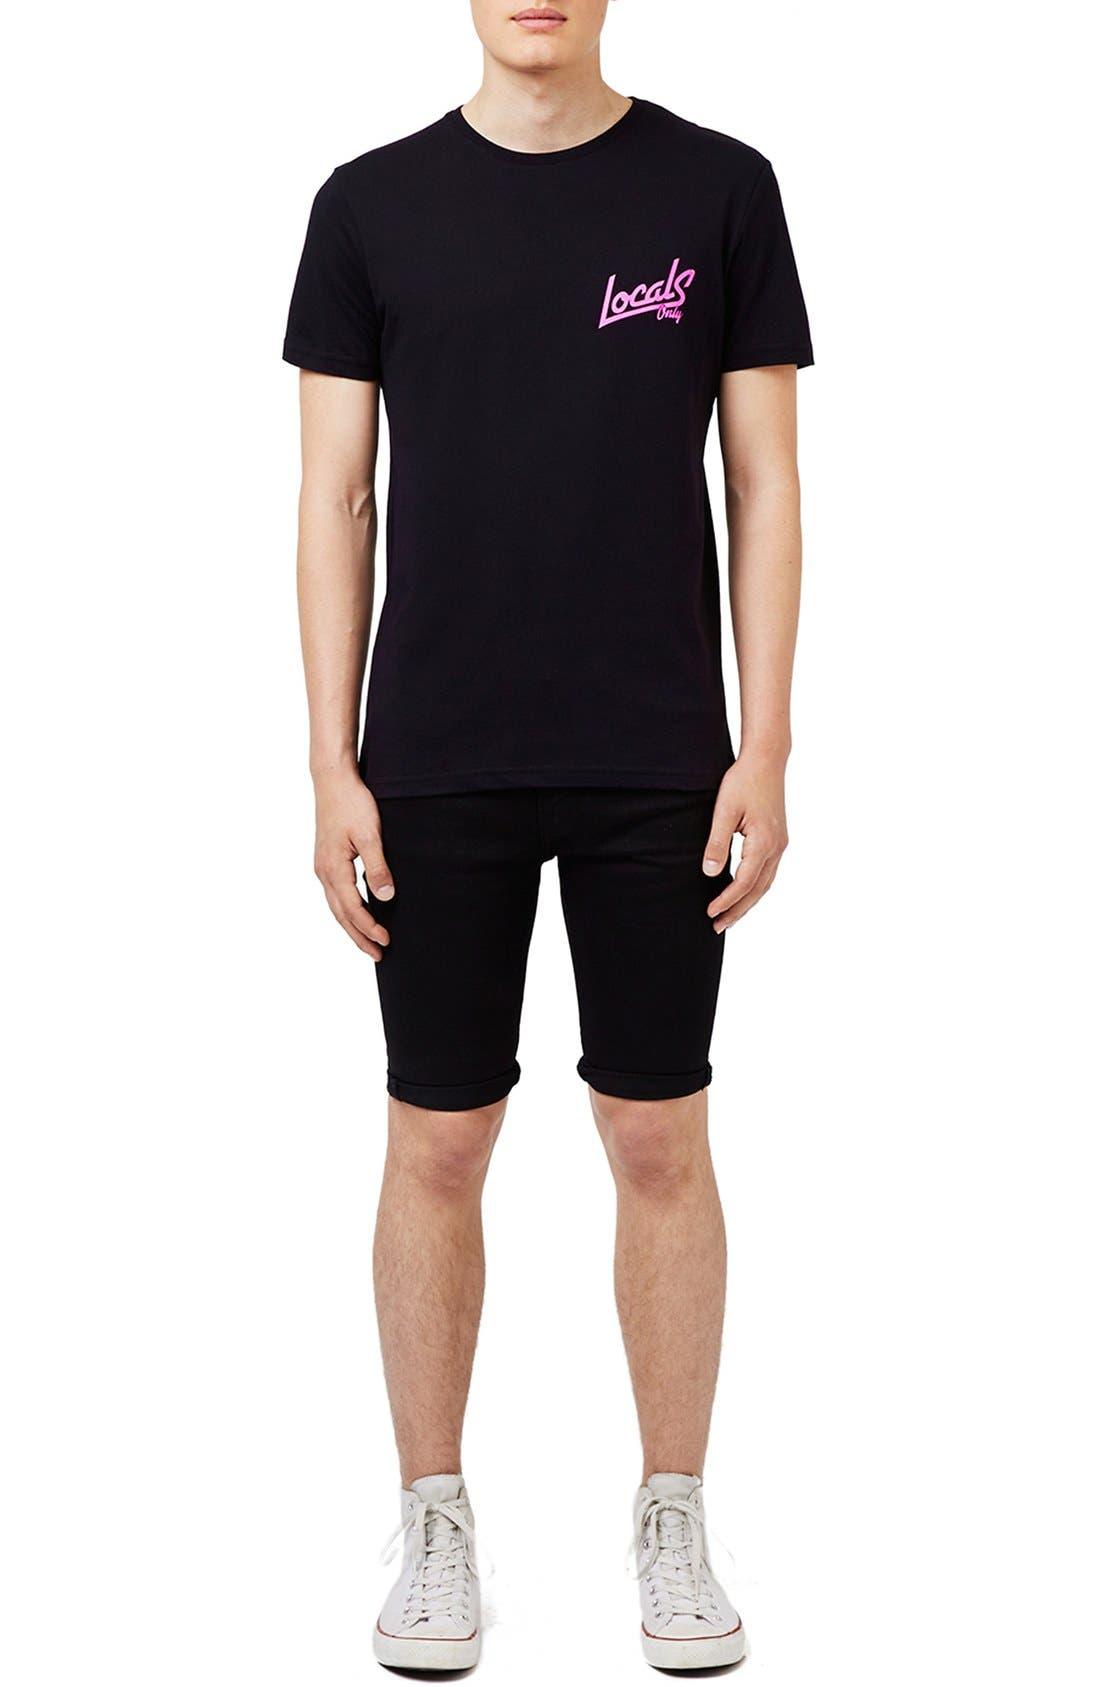 TOPMAN,                             'Locals Only' Graphic Crewneck T-Shirt,                             Alternate thumbnail 4, color,                             001